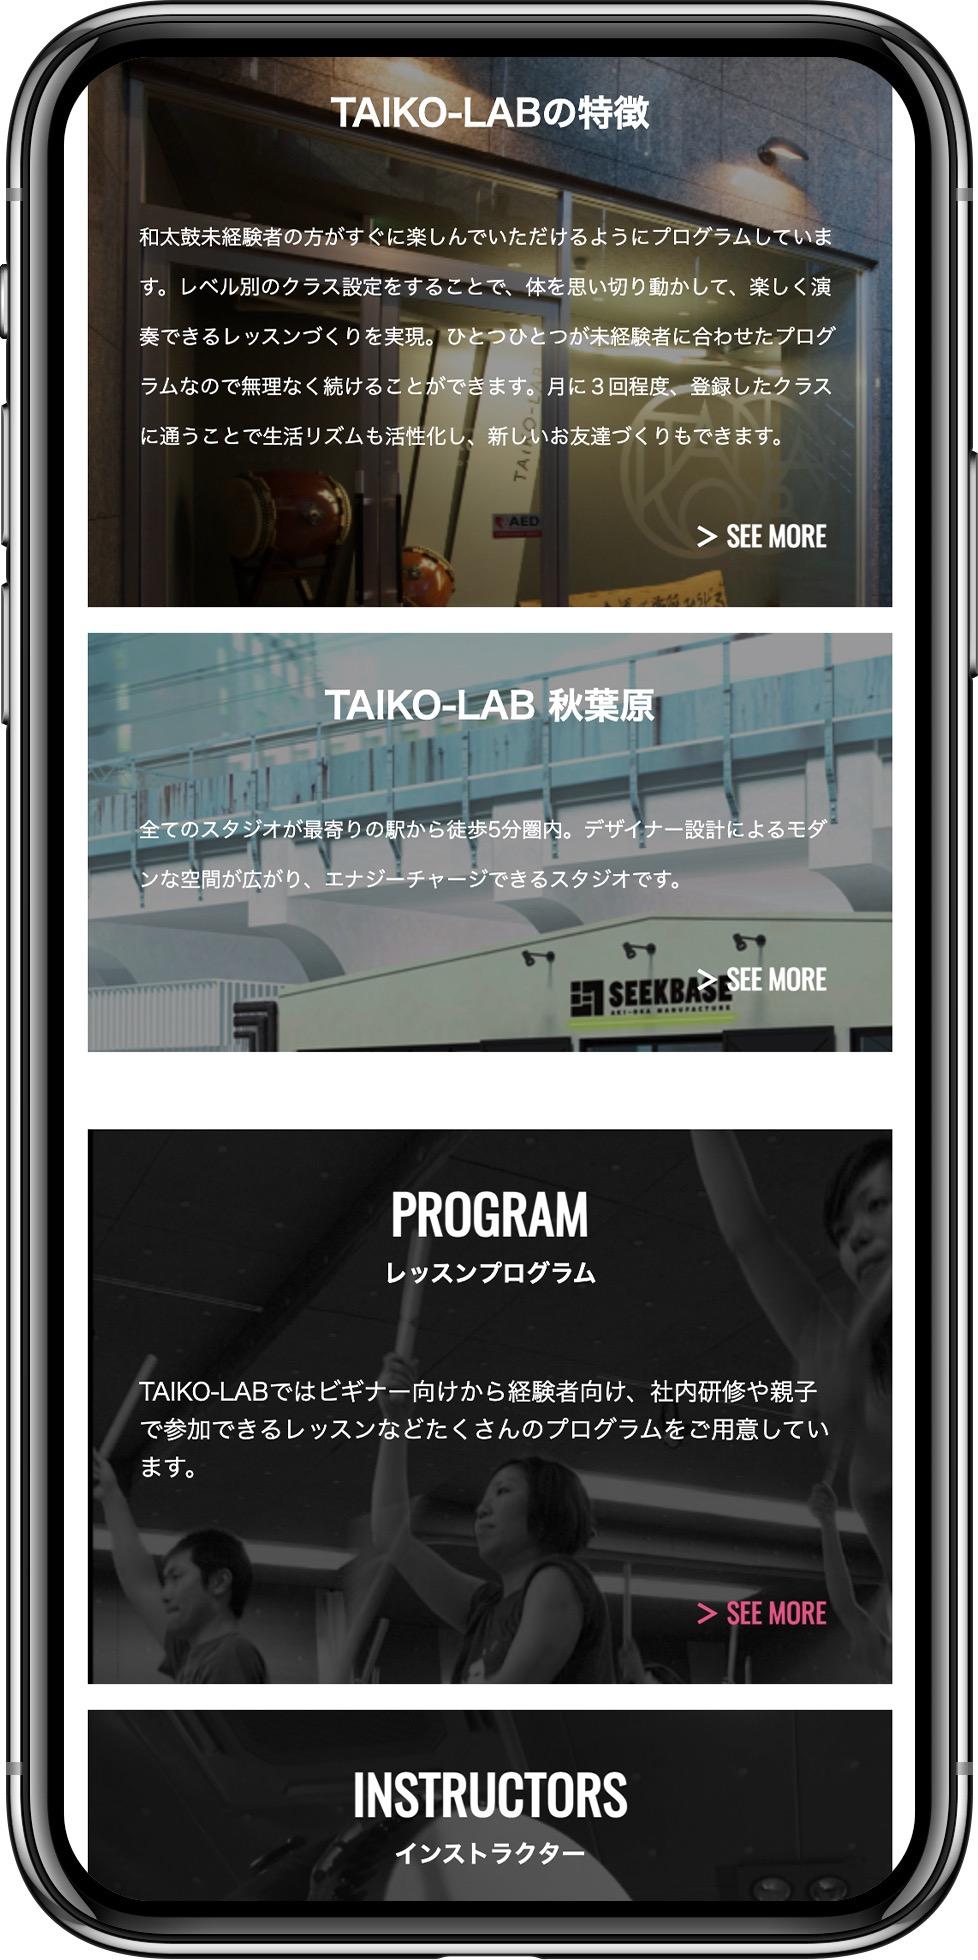 https://artpeace.jp/wp-content/uploads/2021/04/flame_sample-1.png